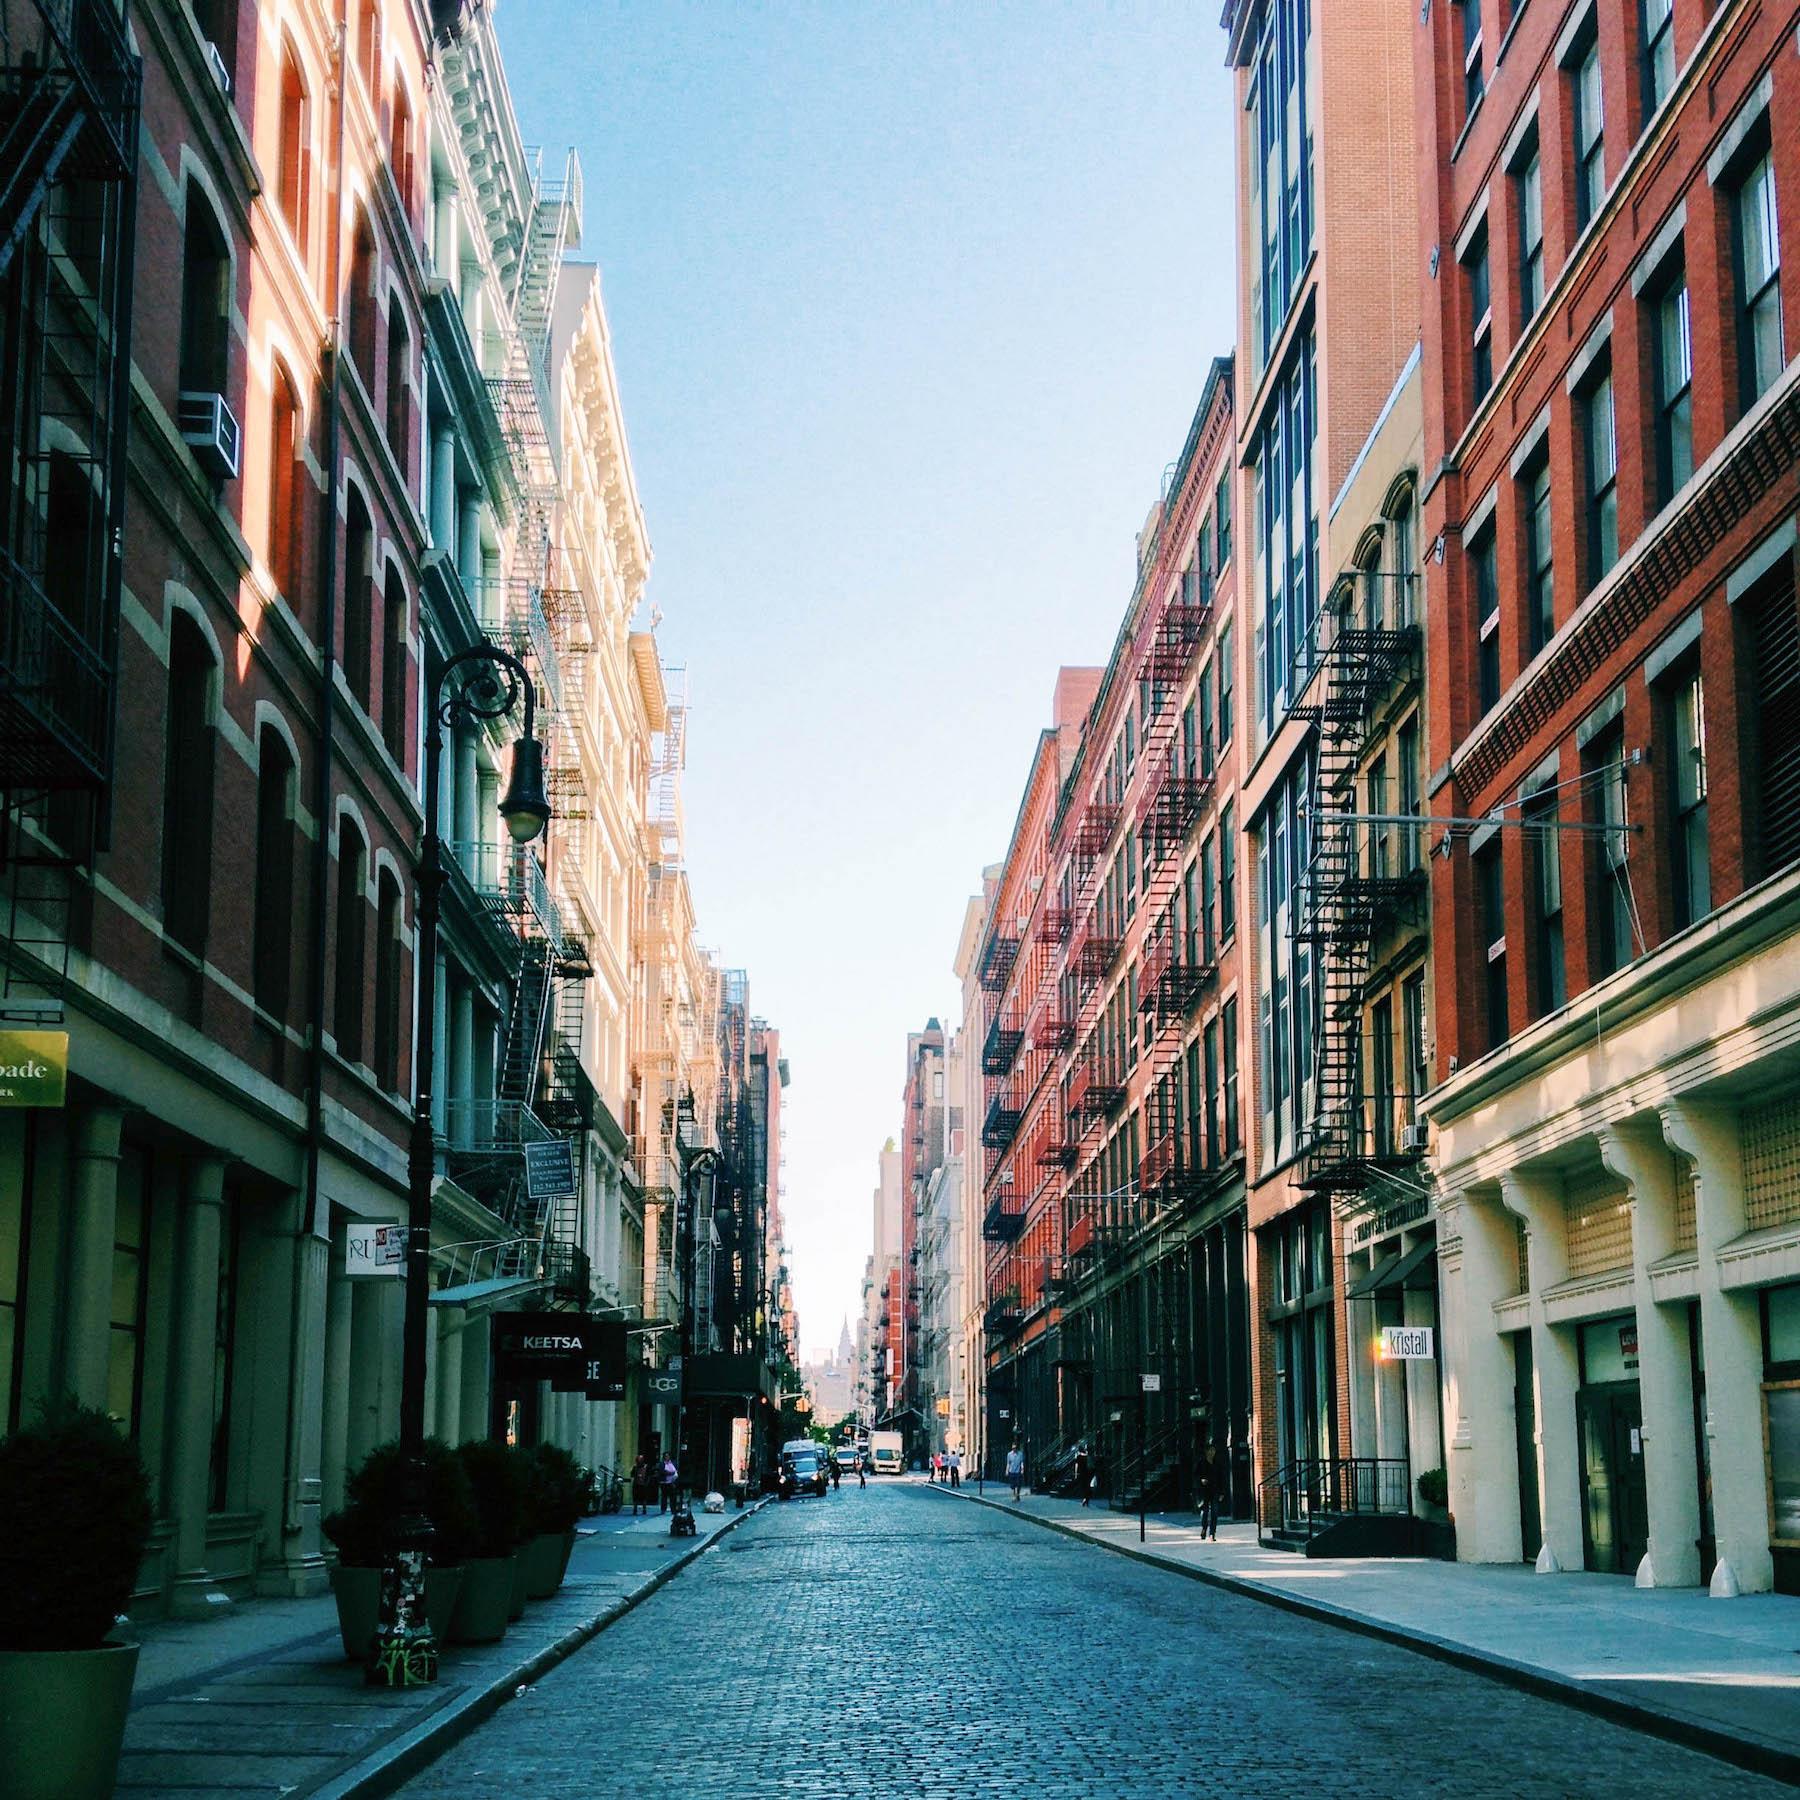 New York kostenlos sightseeing suelovesnyc_susan_fengler_blog_new_york_kostenlos_sightseeing